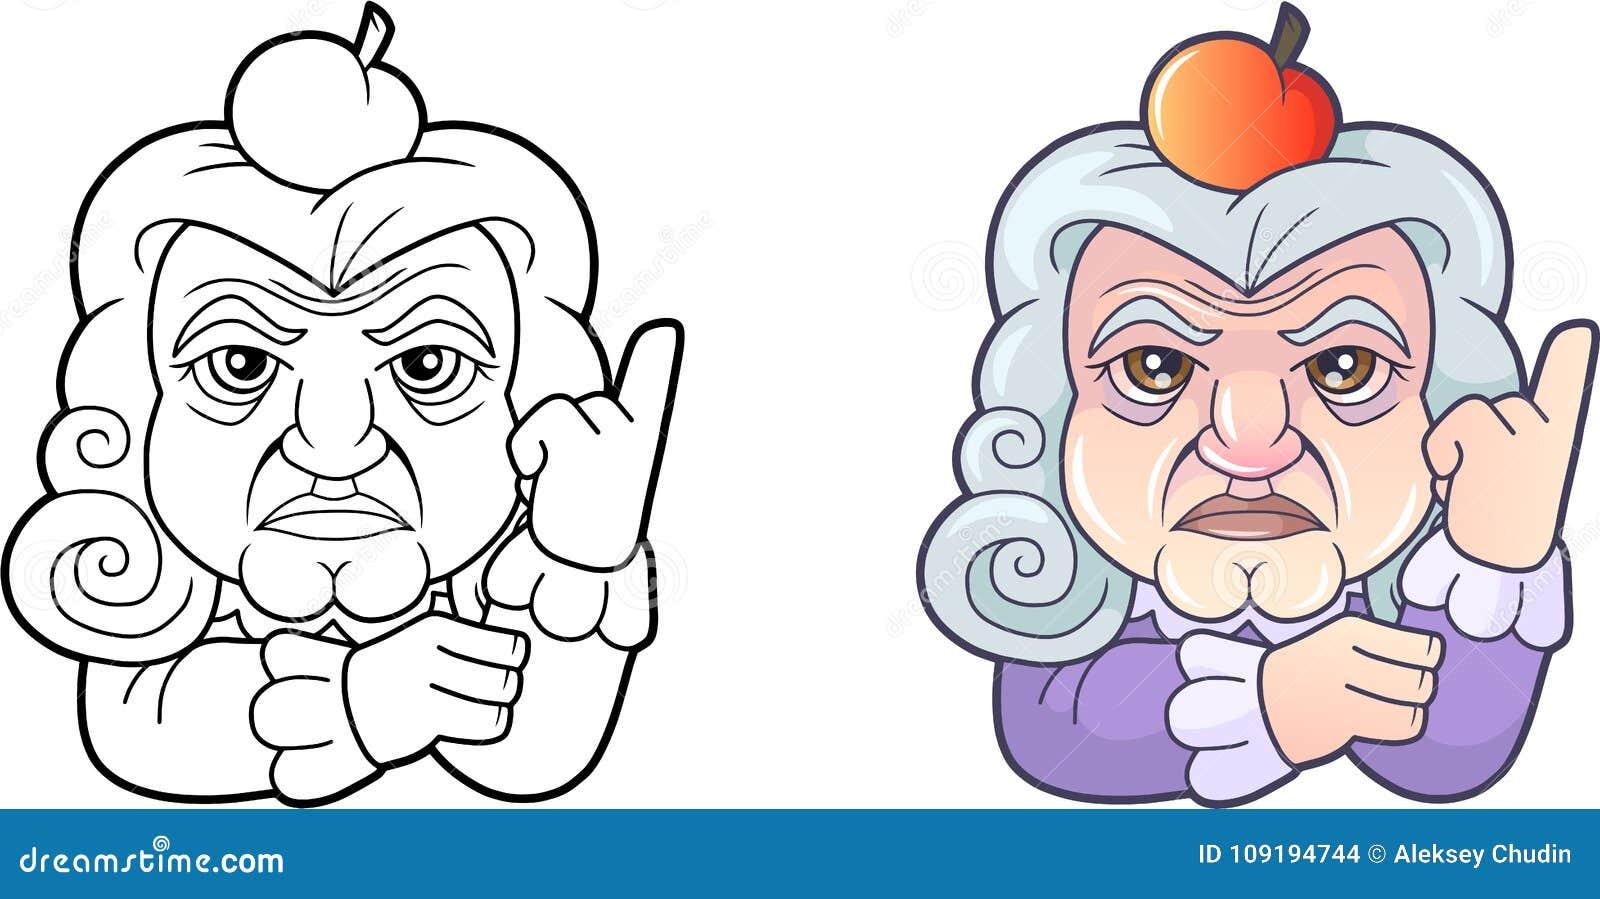 Karikaturwissenschaftler Isaac Newton Lustige Illustration Vektor